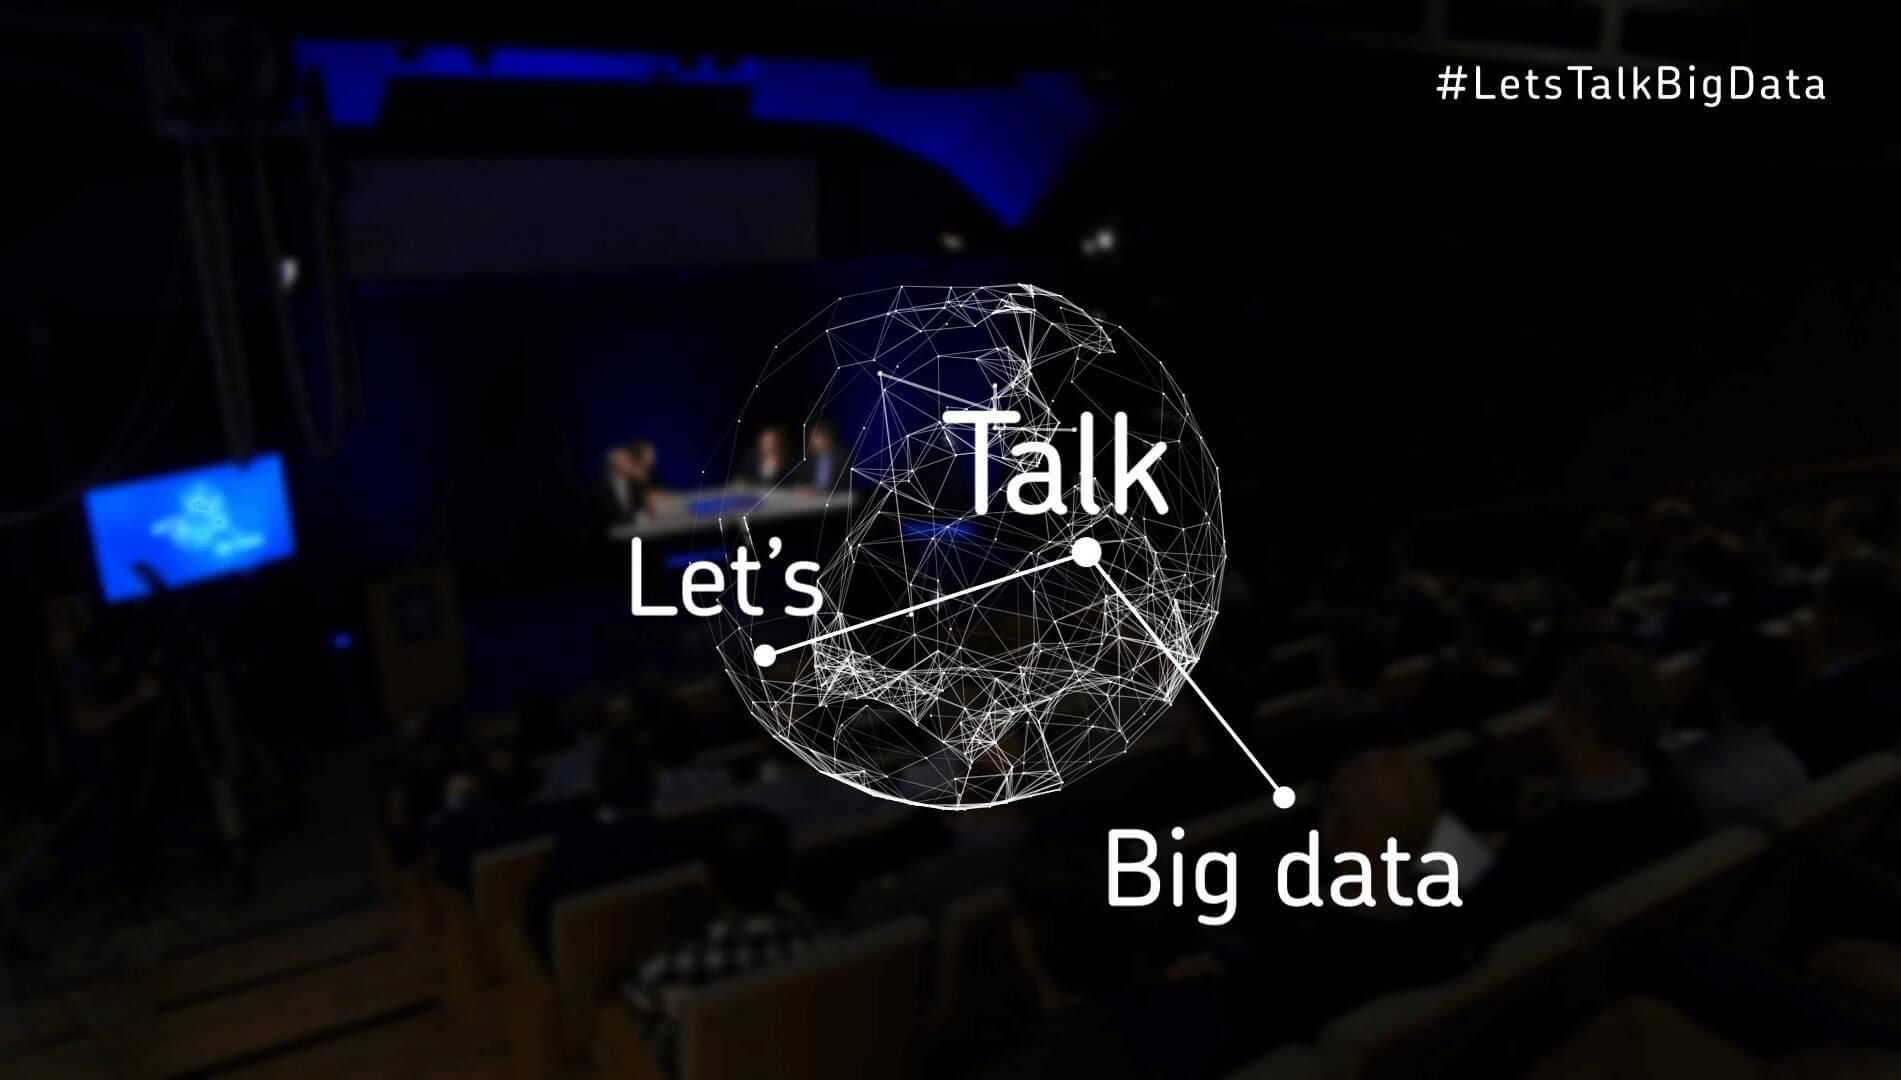 lets talk big data